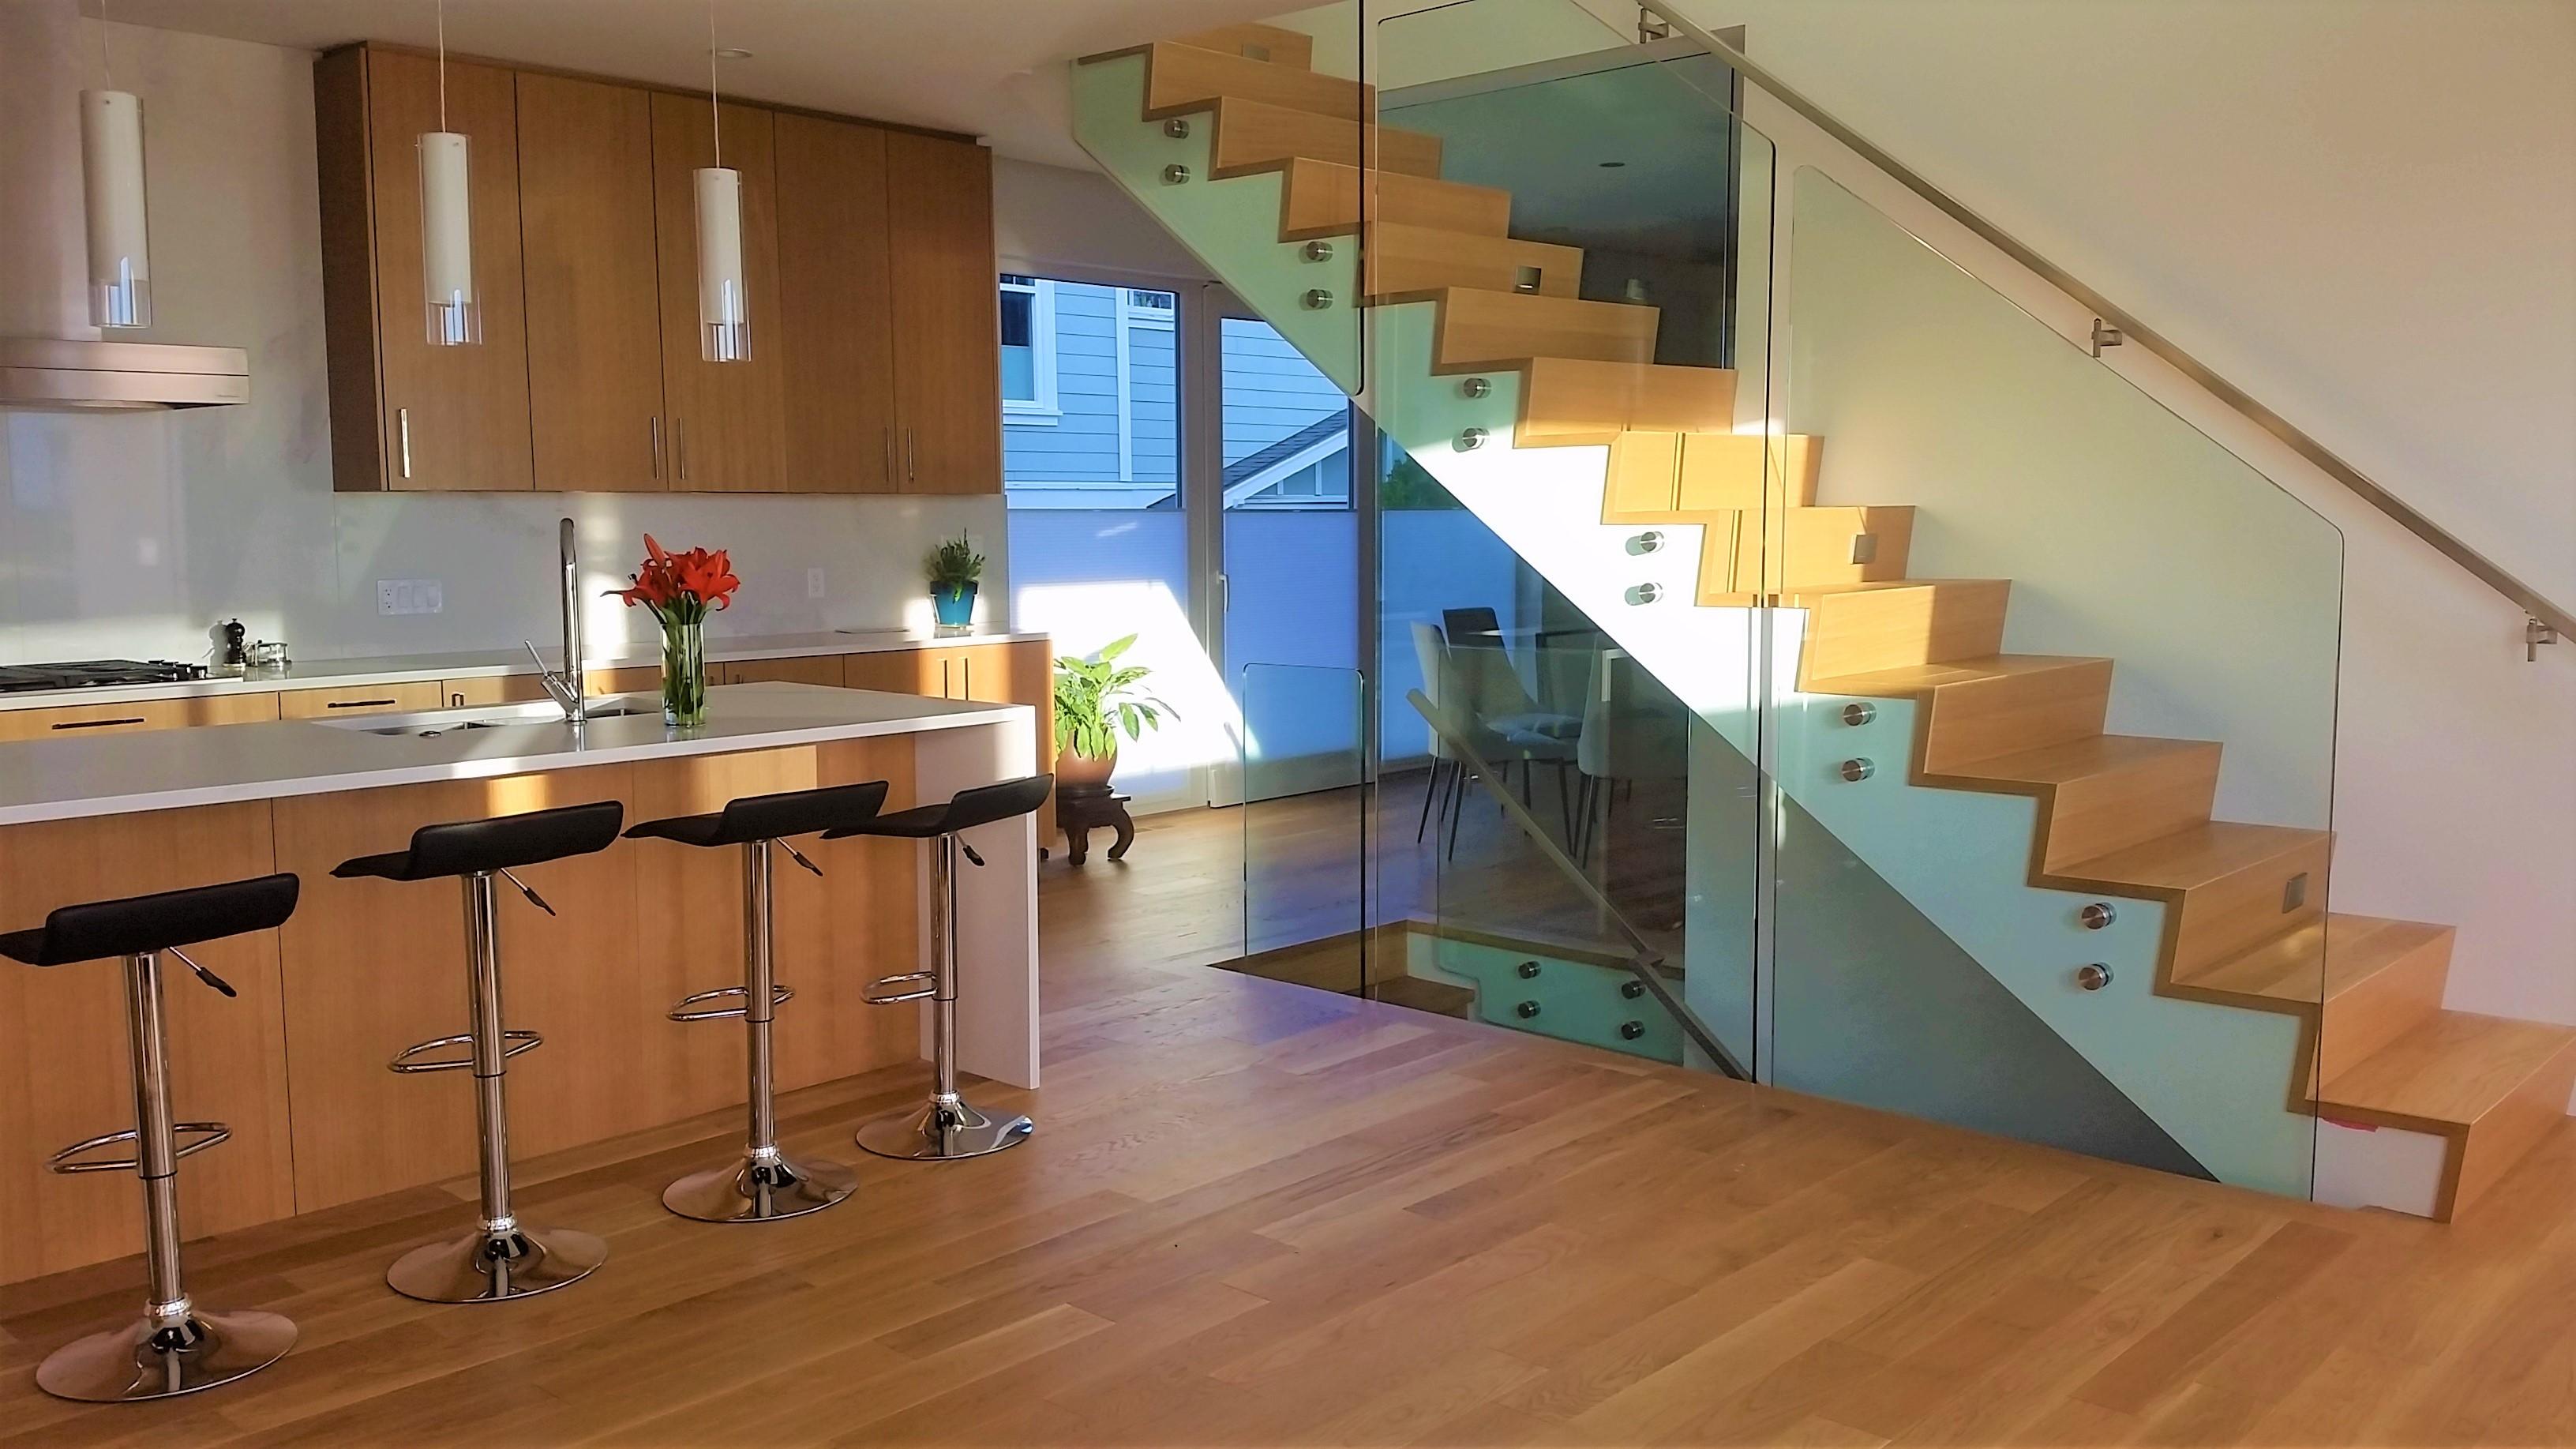 Victoria S Railing Specialists Custom Railings Metal Fabrication,Residential Small Backyard Landscape Design